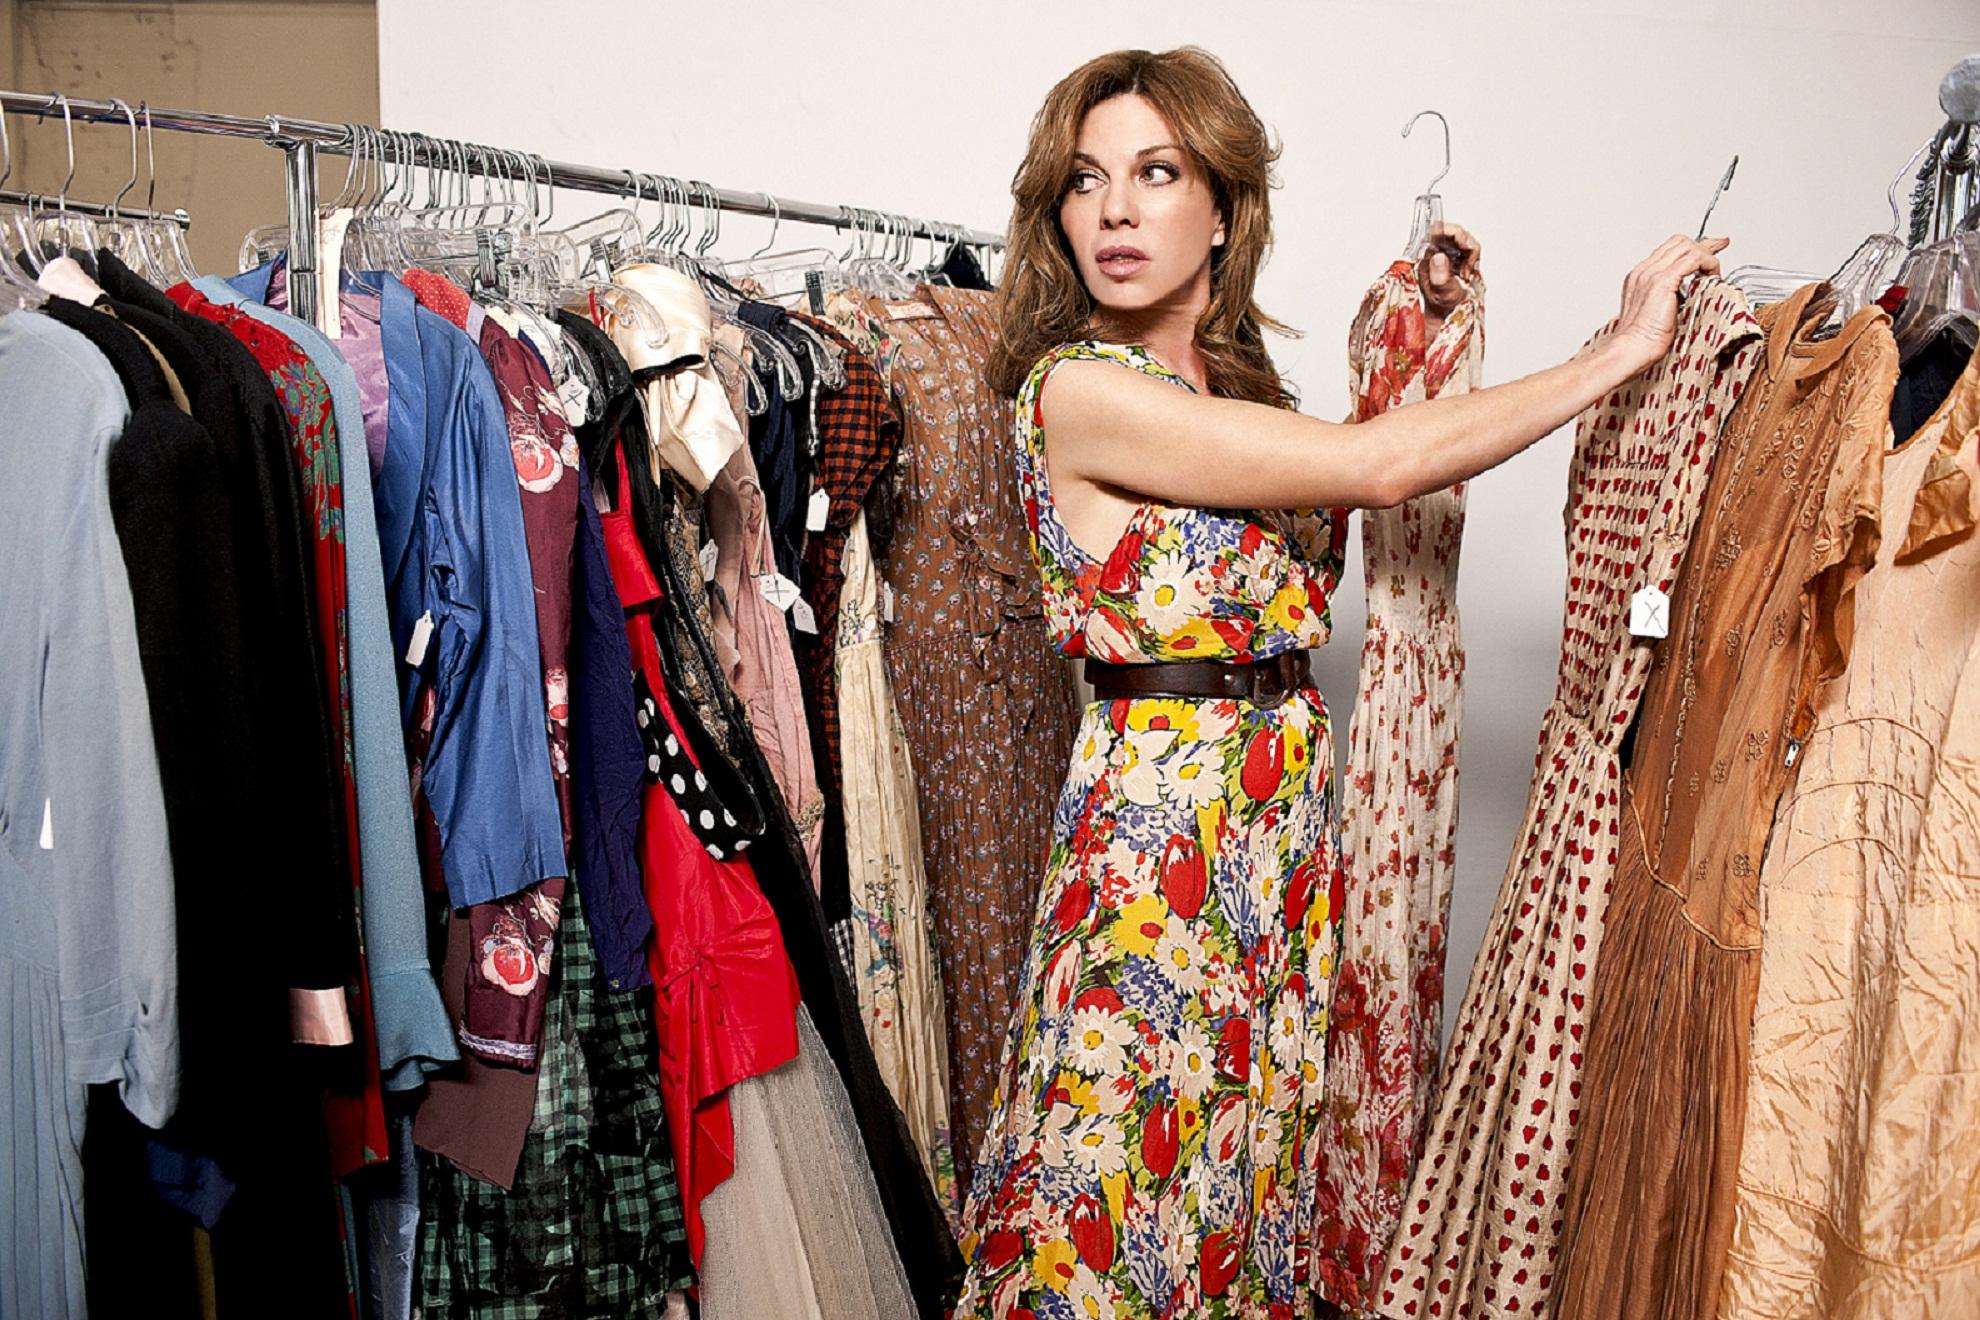 8 Secrets For Vintage Shopping Success